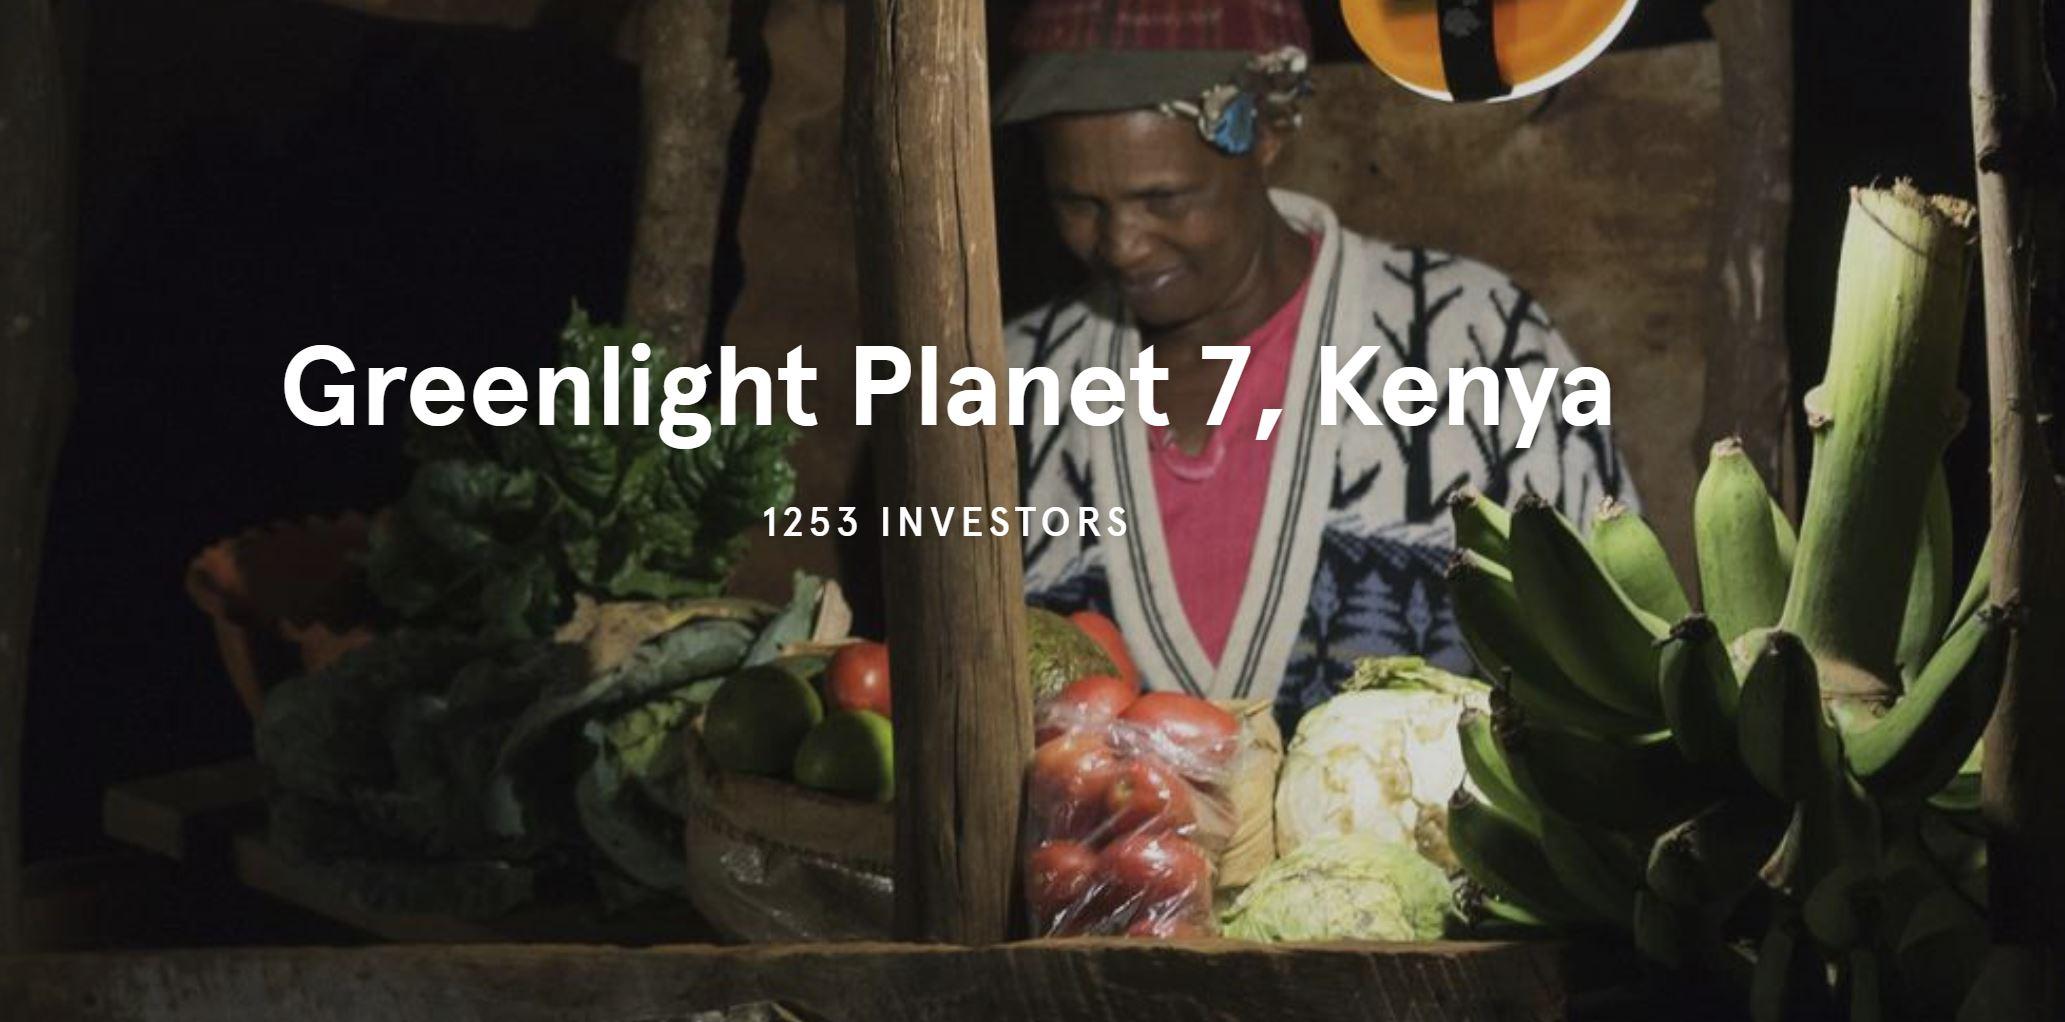 Investera via Trine i Greenlight Planet 7